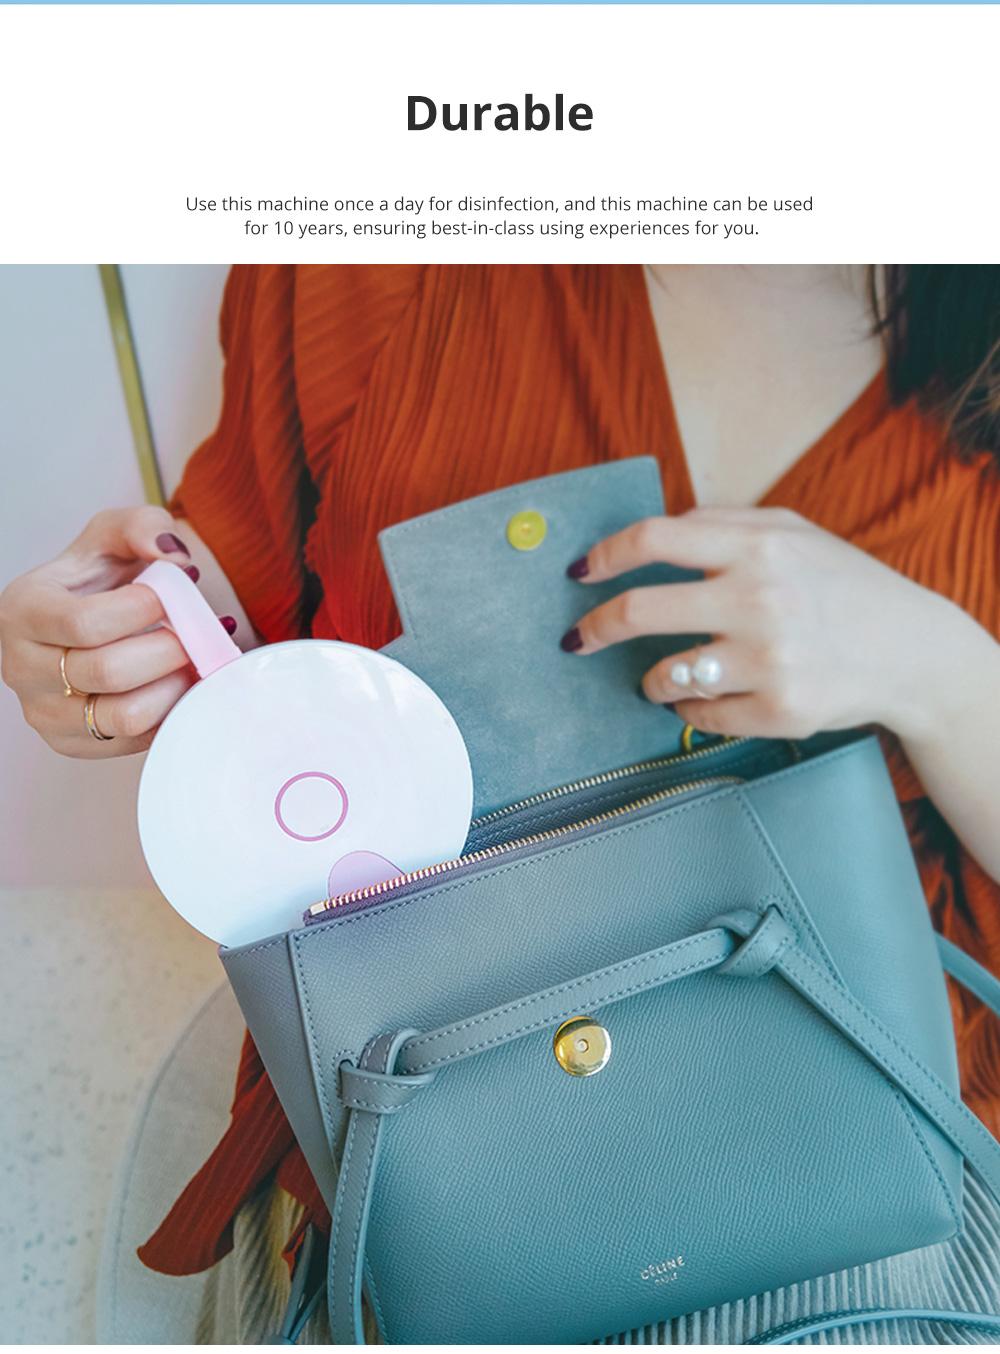 Portable Professional Quick Ultraviolet Ray Disinfectant Machine Bowls Chopsticks Phone Sterilizer 5